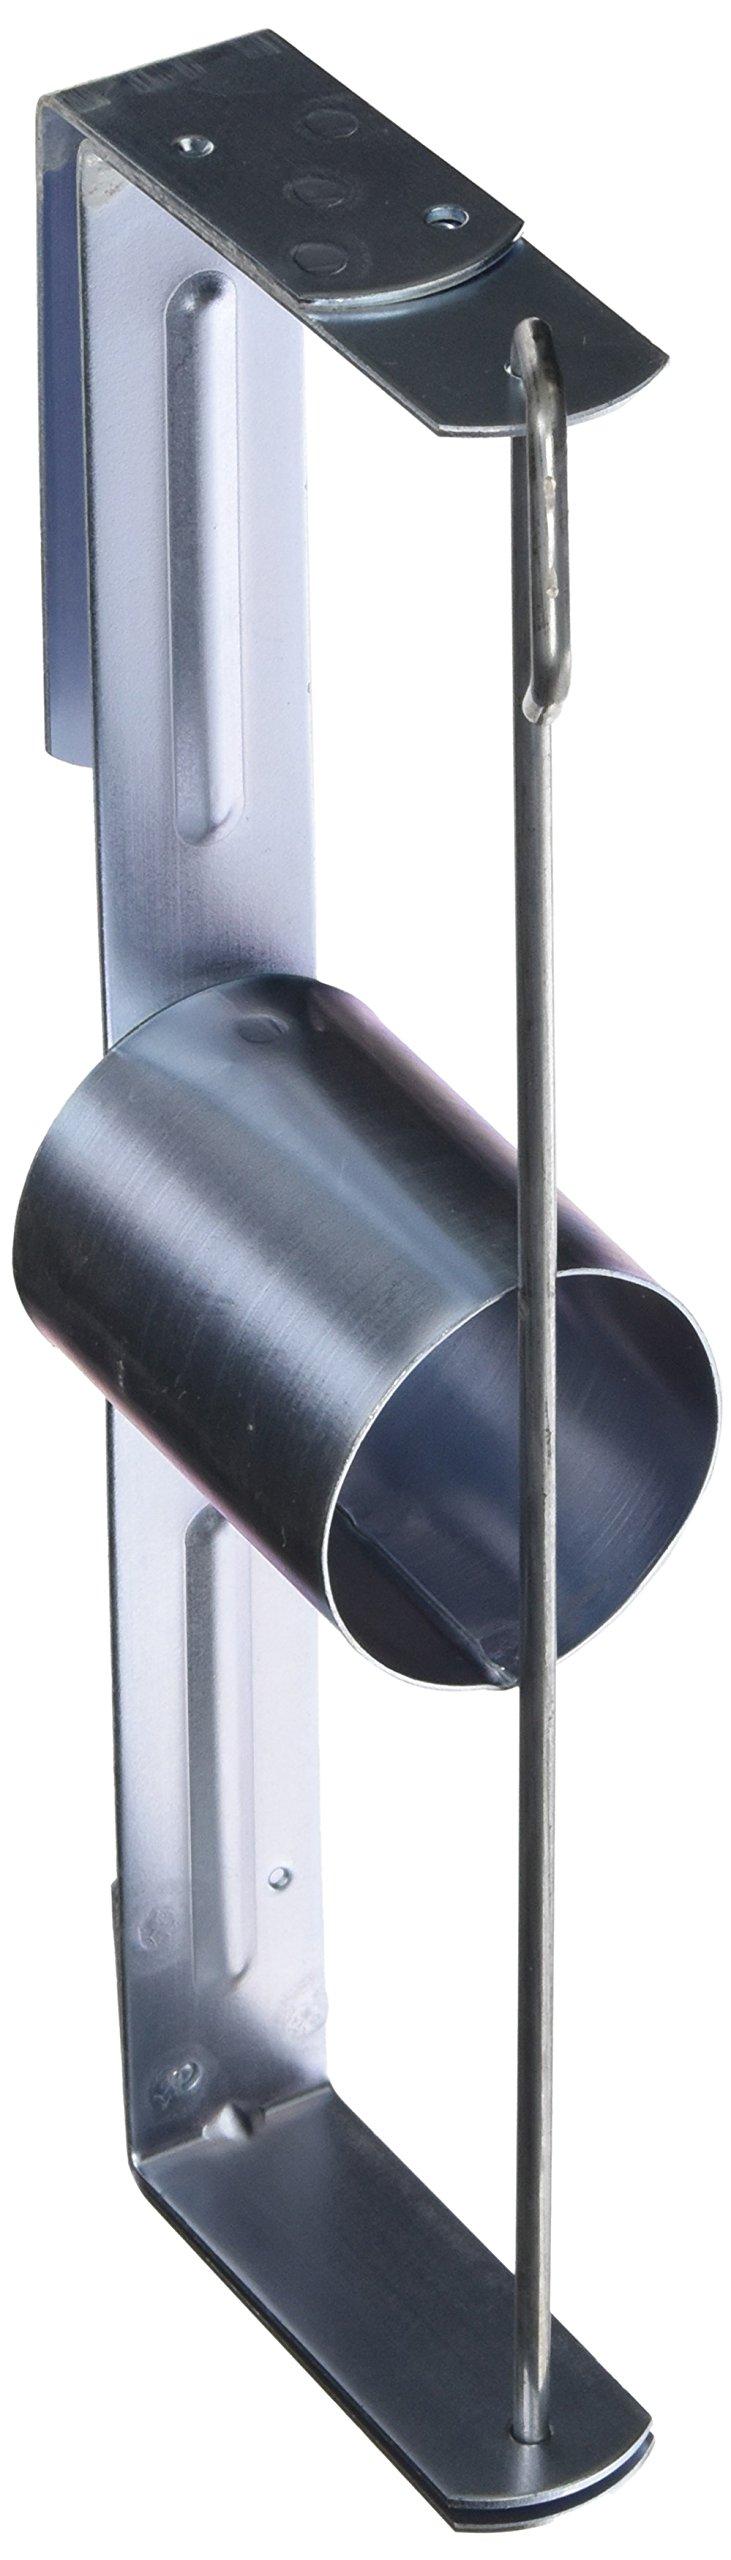 Kraft Tool DW224 Drywall Tape Holder